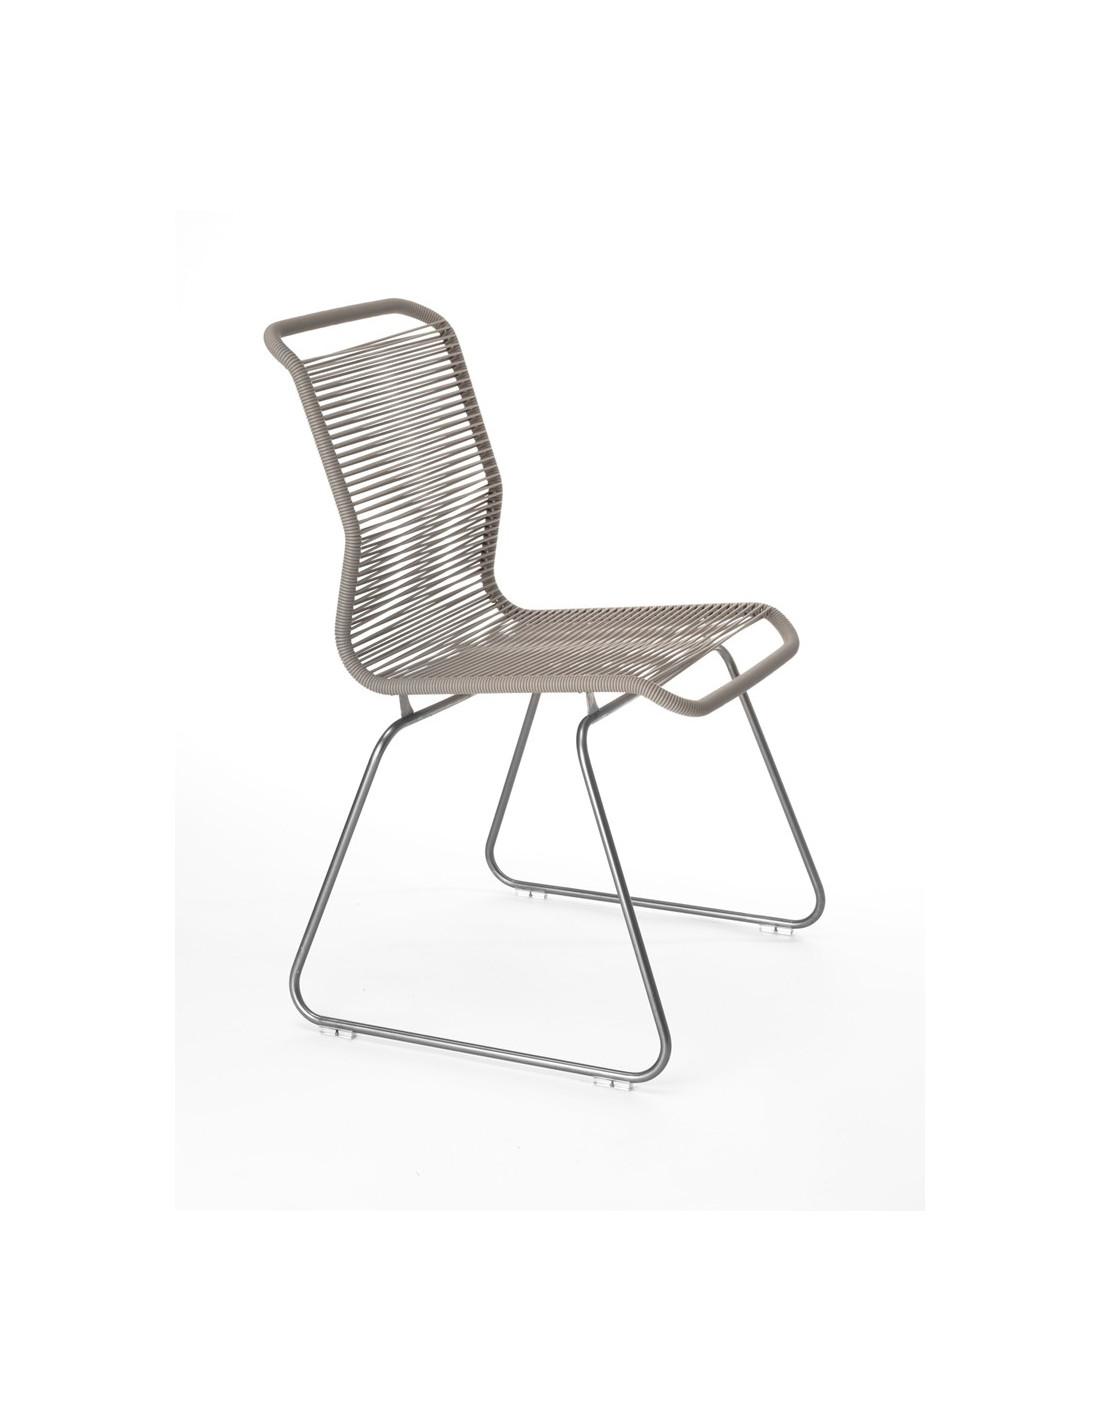 chair panton one verner panton montana. Black Bedroom Furniture Sets. Home Design Ideas